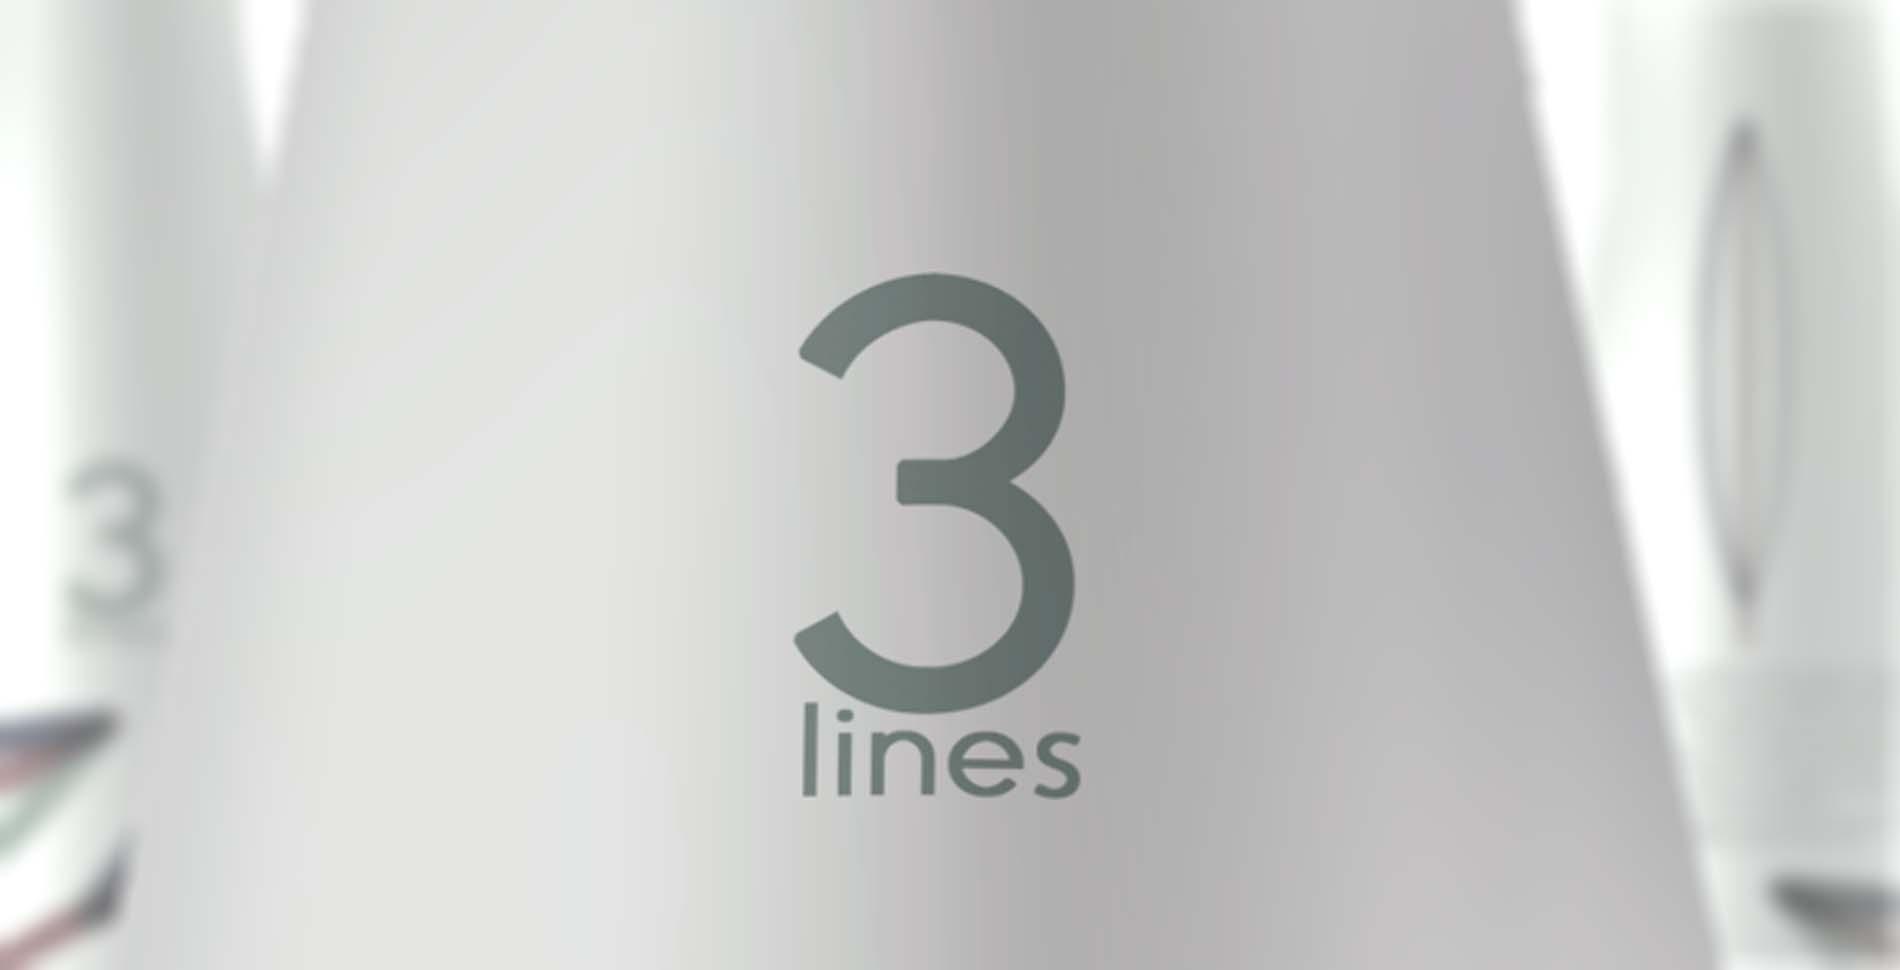 Logo Branding Packaging Illustration Web Σχεδιασμός Λογοτύπου Σχεδιασμός Συσκευασίας Φιορετζης Δημητρης γραφιστας graphic design Κρητική διατροφή Ηράκλειο Κρήτης